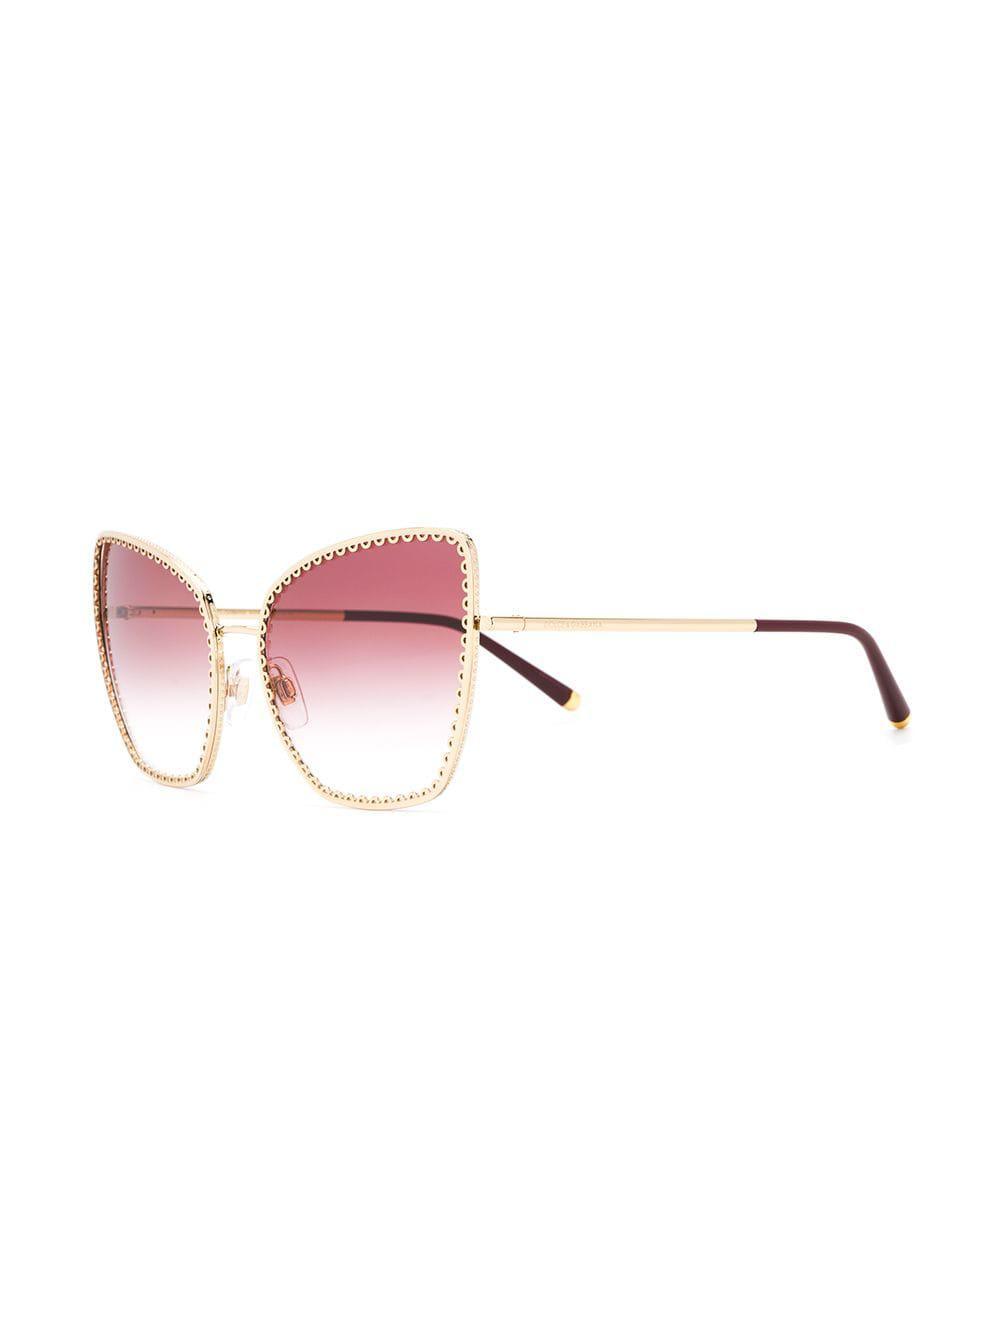 7906e5c22cb Lyst - Dolce   Gabbana Oversized Cat-eye Sunglasses in Metallic